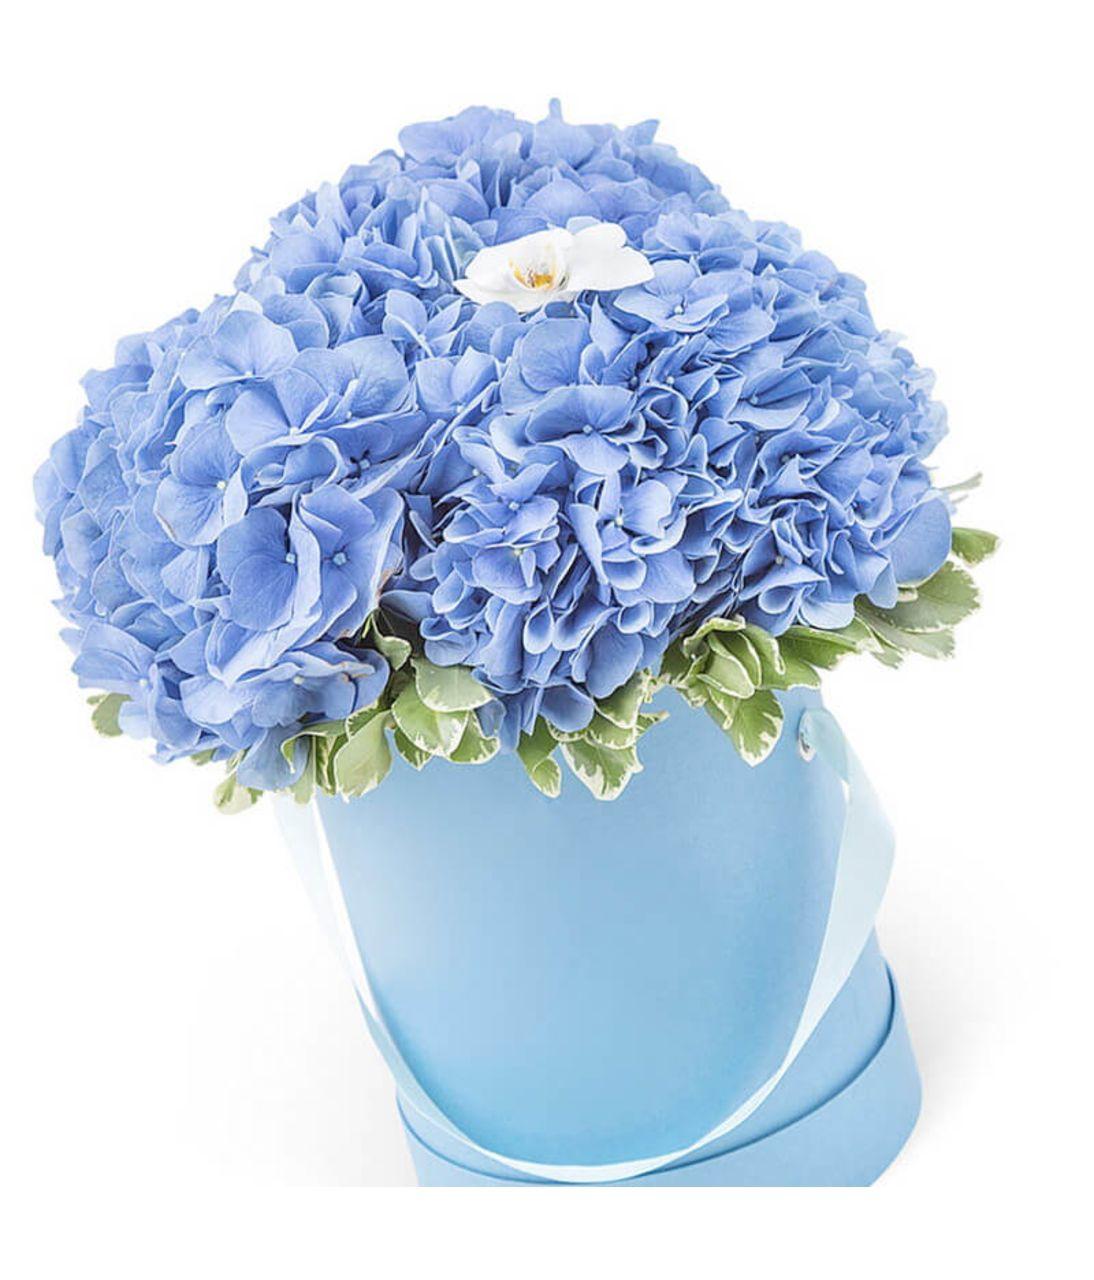 "Букет з синьою гортензією ""Ніжне хмара"". Superflowers.com.ua"